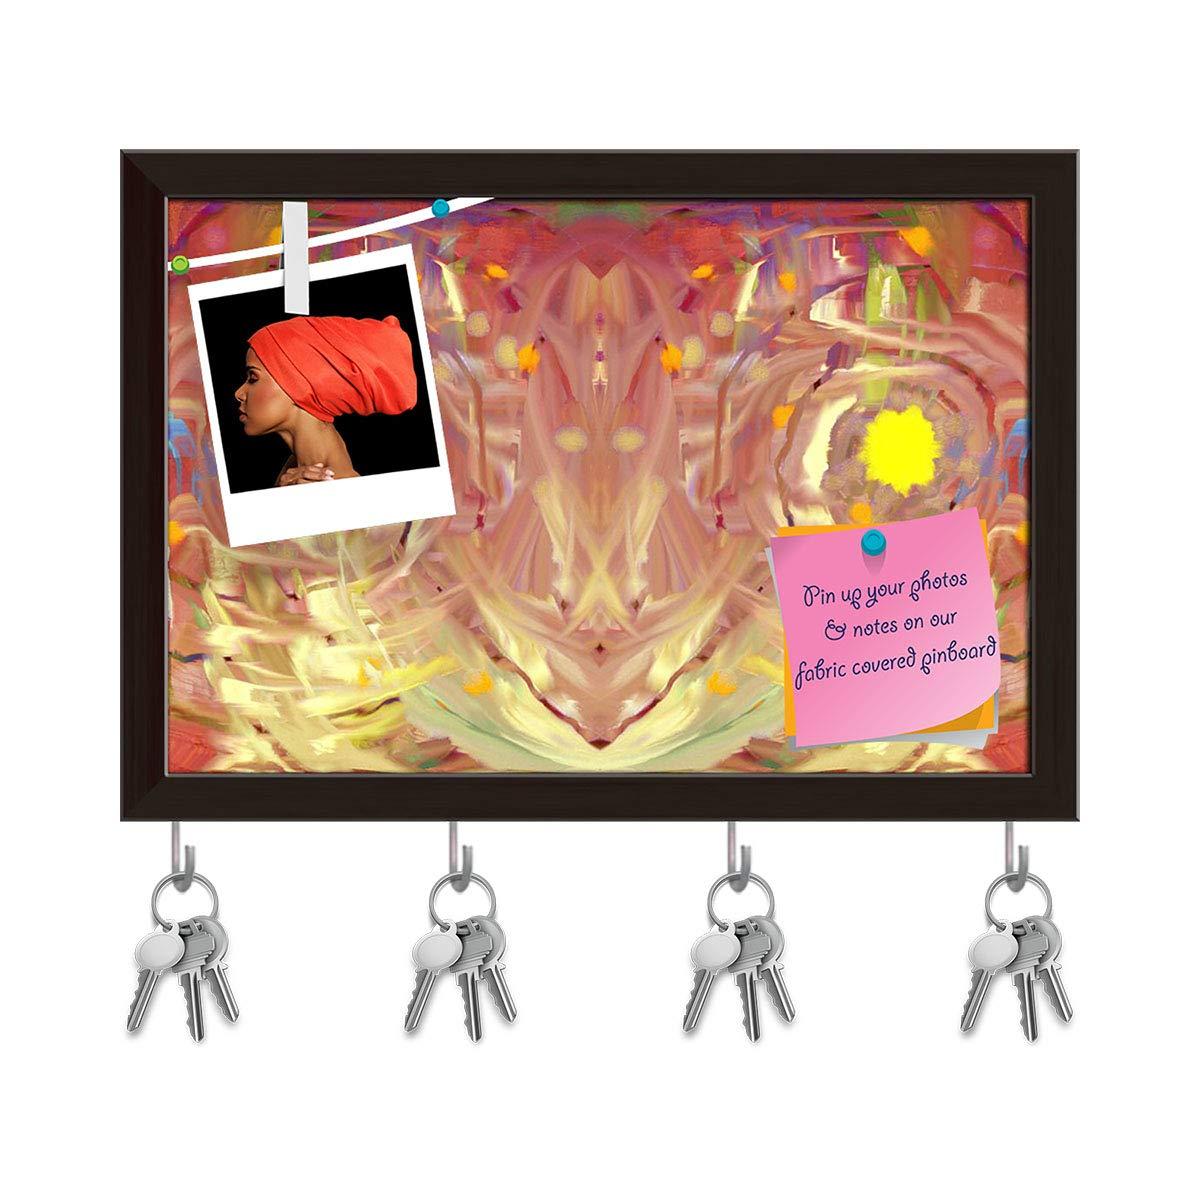 Dark Brown Frame 14.5inch x 10inch (36.8cms x 25.4cms) Artzfolio Abstract Artwork D226 Key Holder Hooks   Notice Pin Board   Antique golden Frame 17.5 X 12Inch